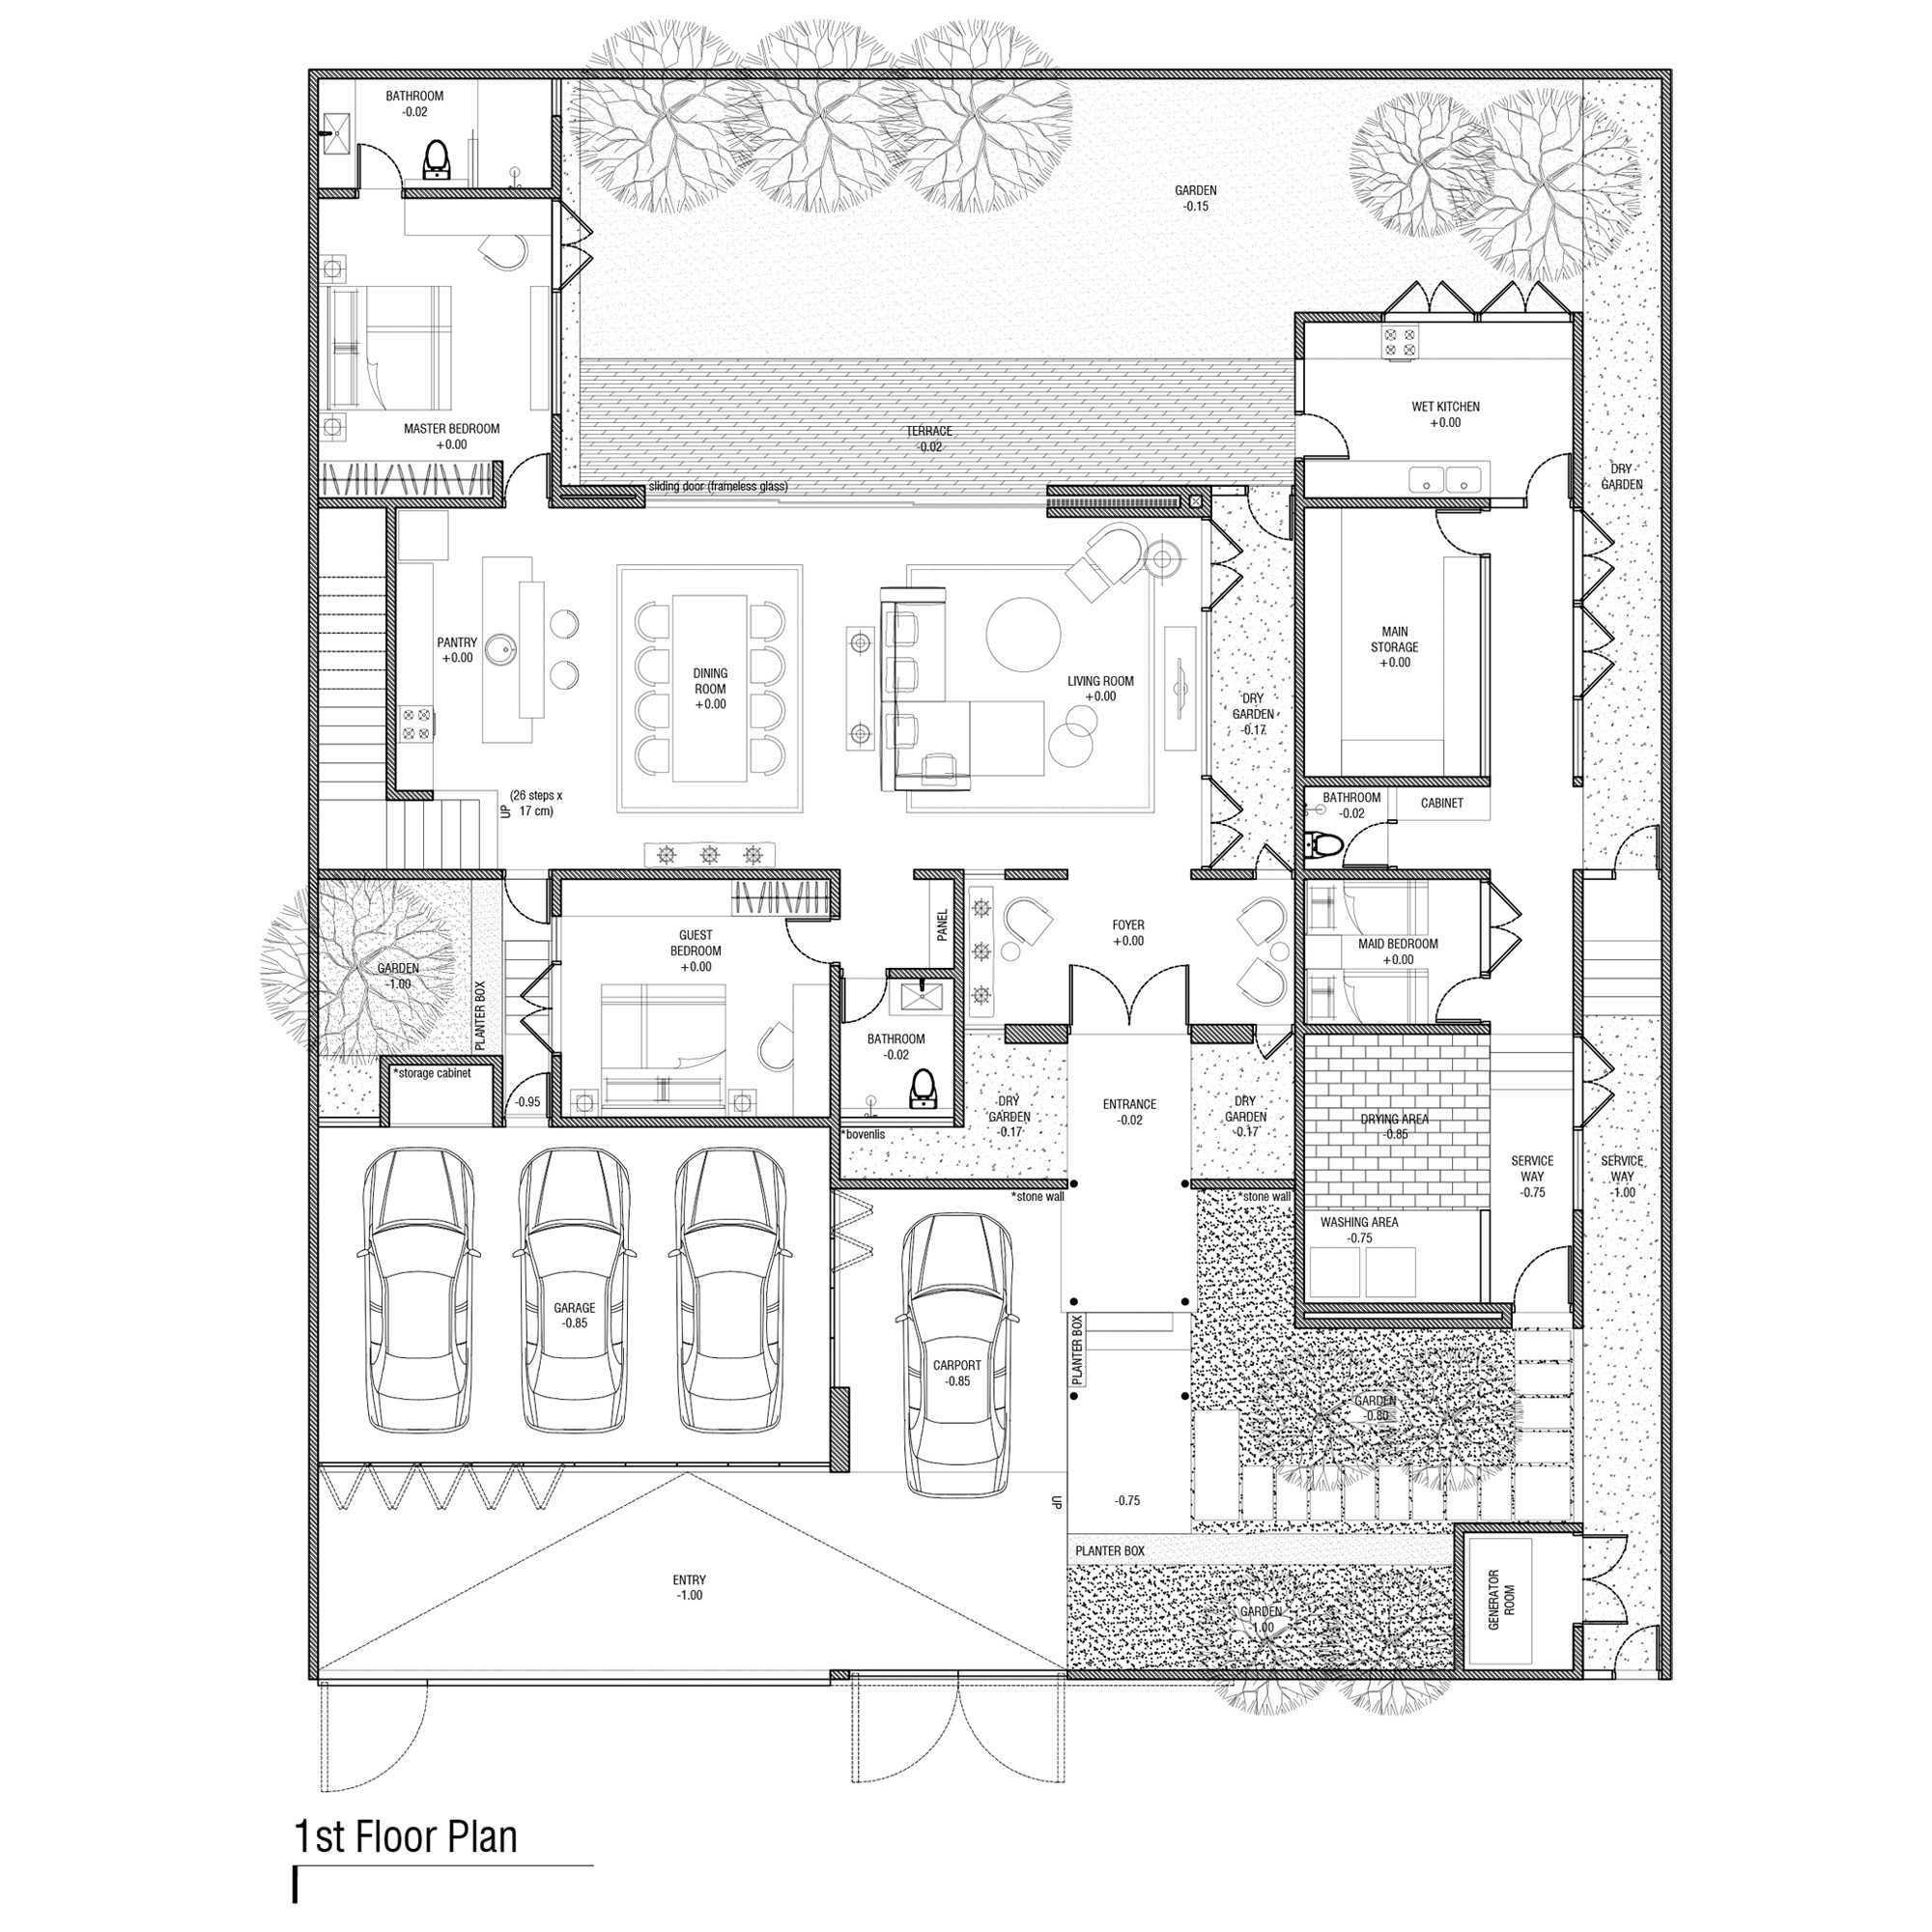 Y0 Design Architect S House Kec. Srono, Kabupaten Banyuwangi, Jawa Timur, Indonesia Kec. Srono, Kabupaten Banyuwangi, Jawa Timur, Indonesia Yohanes-Iswara-Limandjaya-S-House  121105